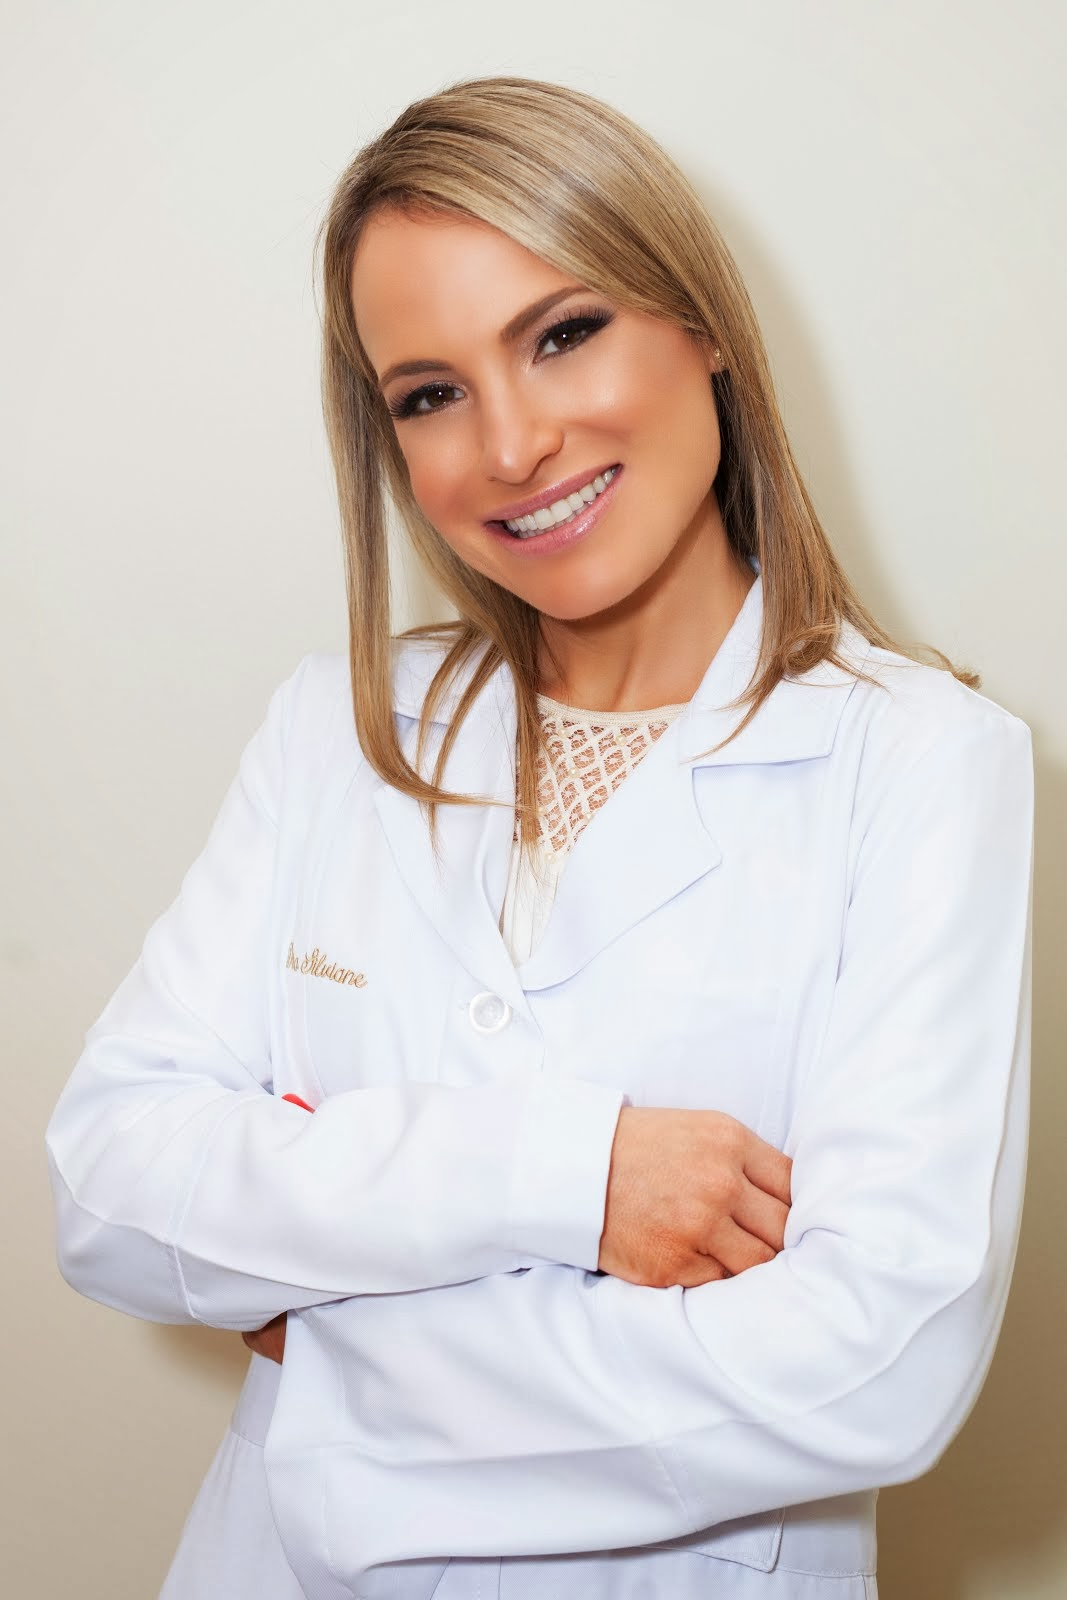 Dra. Silviane Pellegrinello Soares